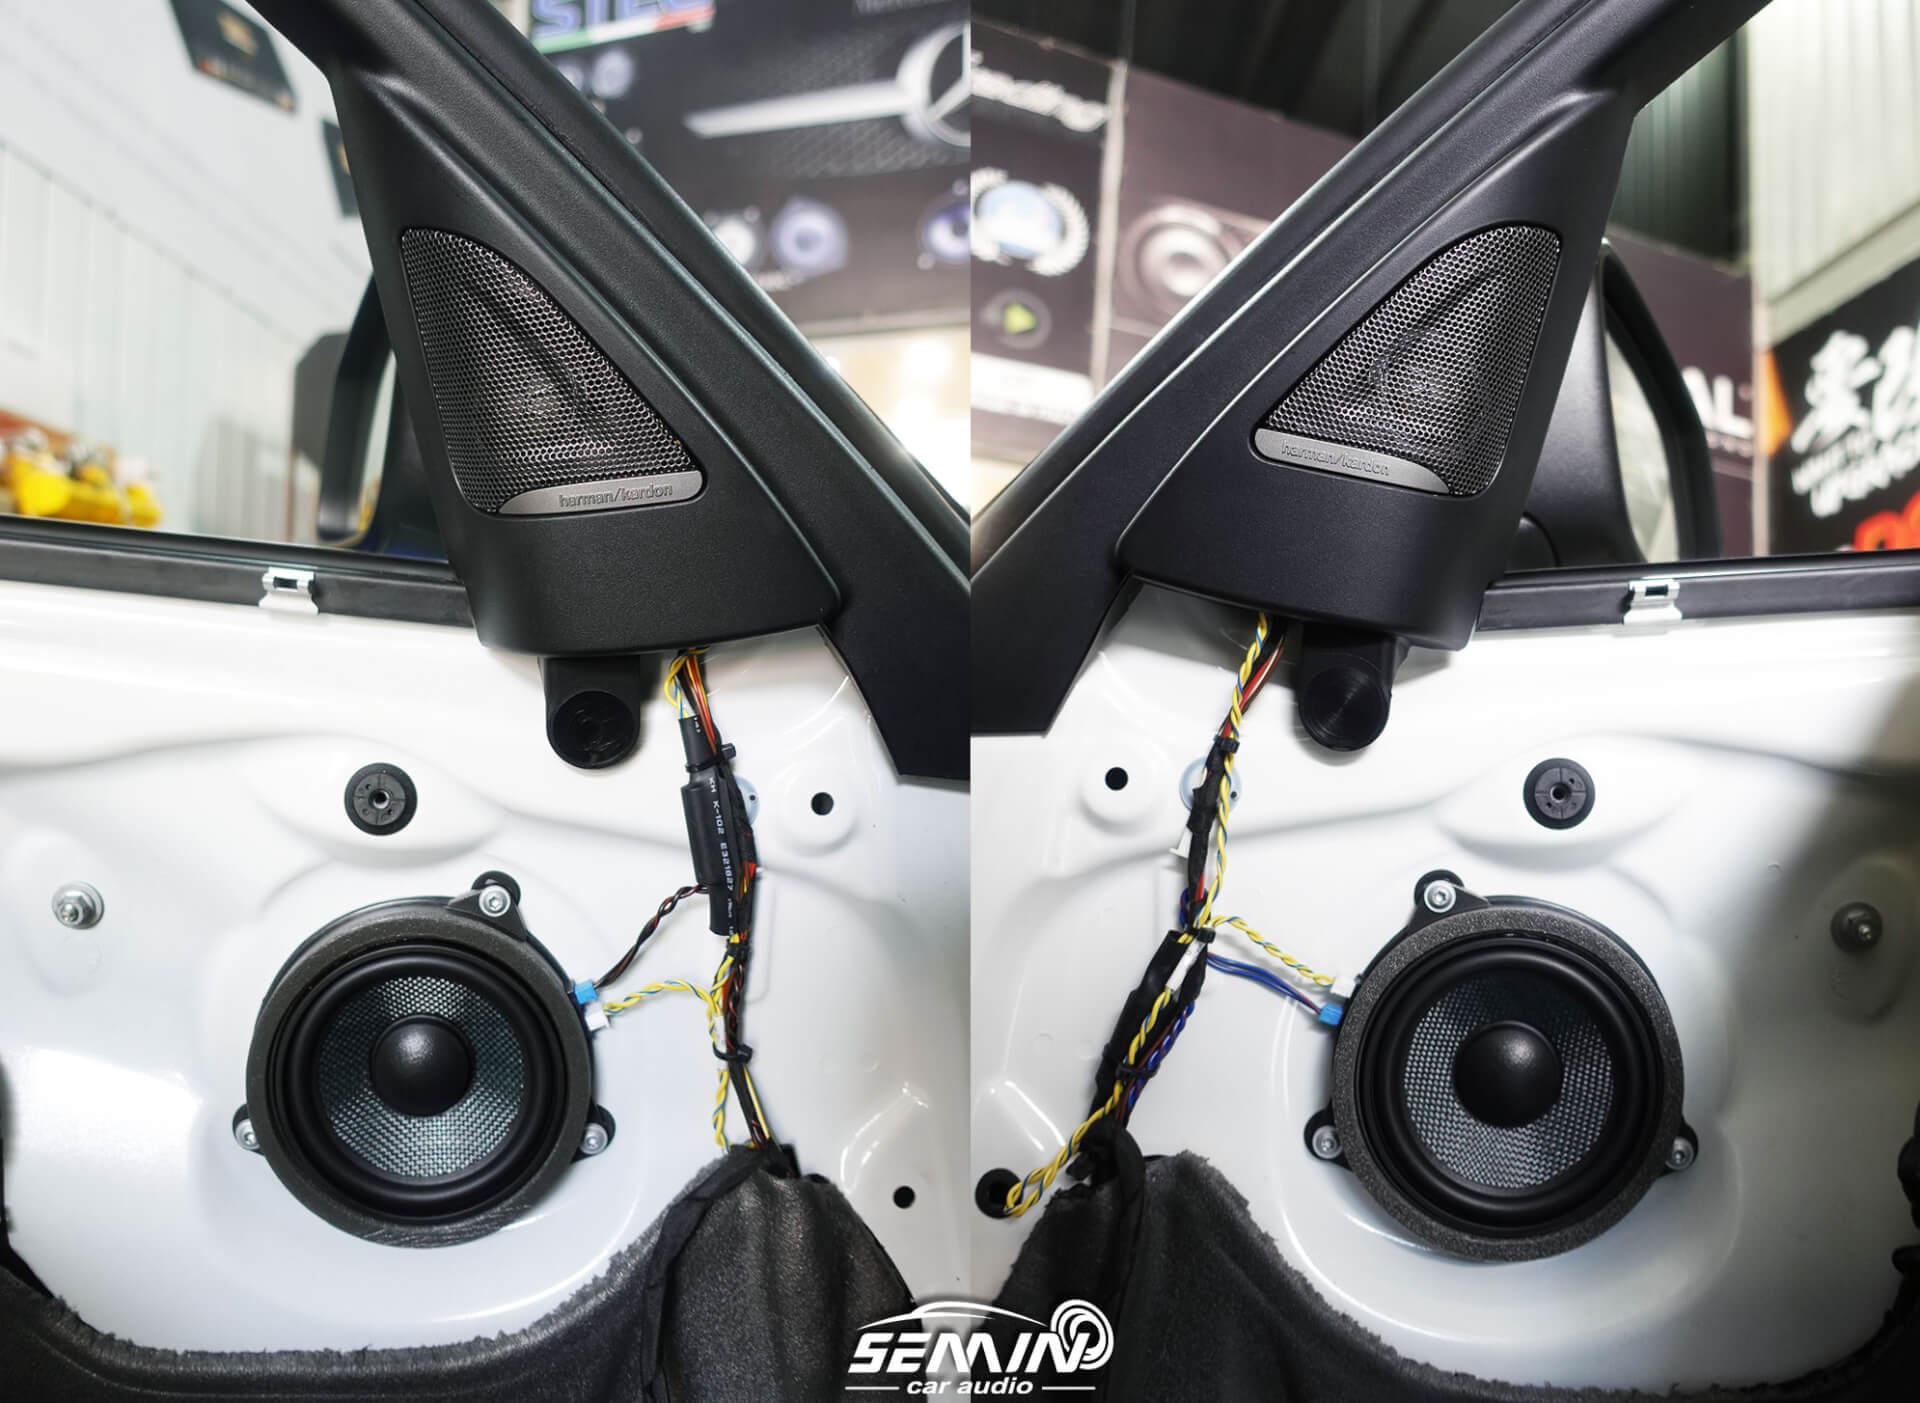 F30 無損升級 ZEST 專用喇叭+DSP擴大機